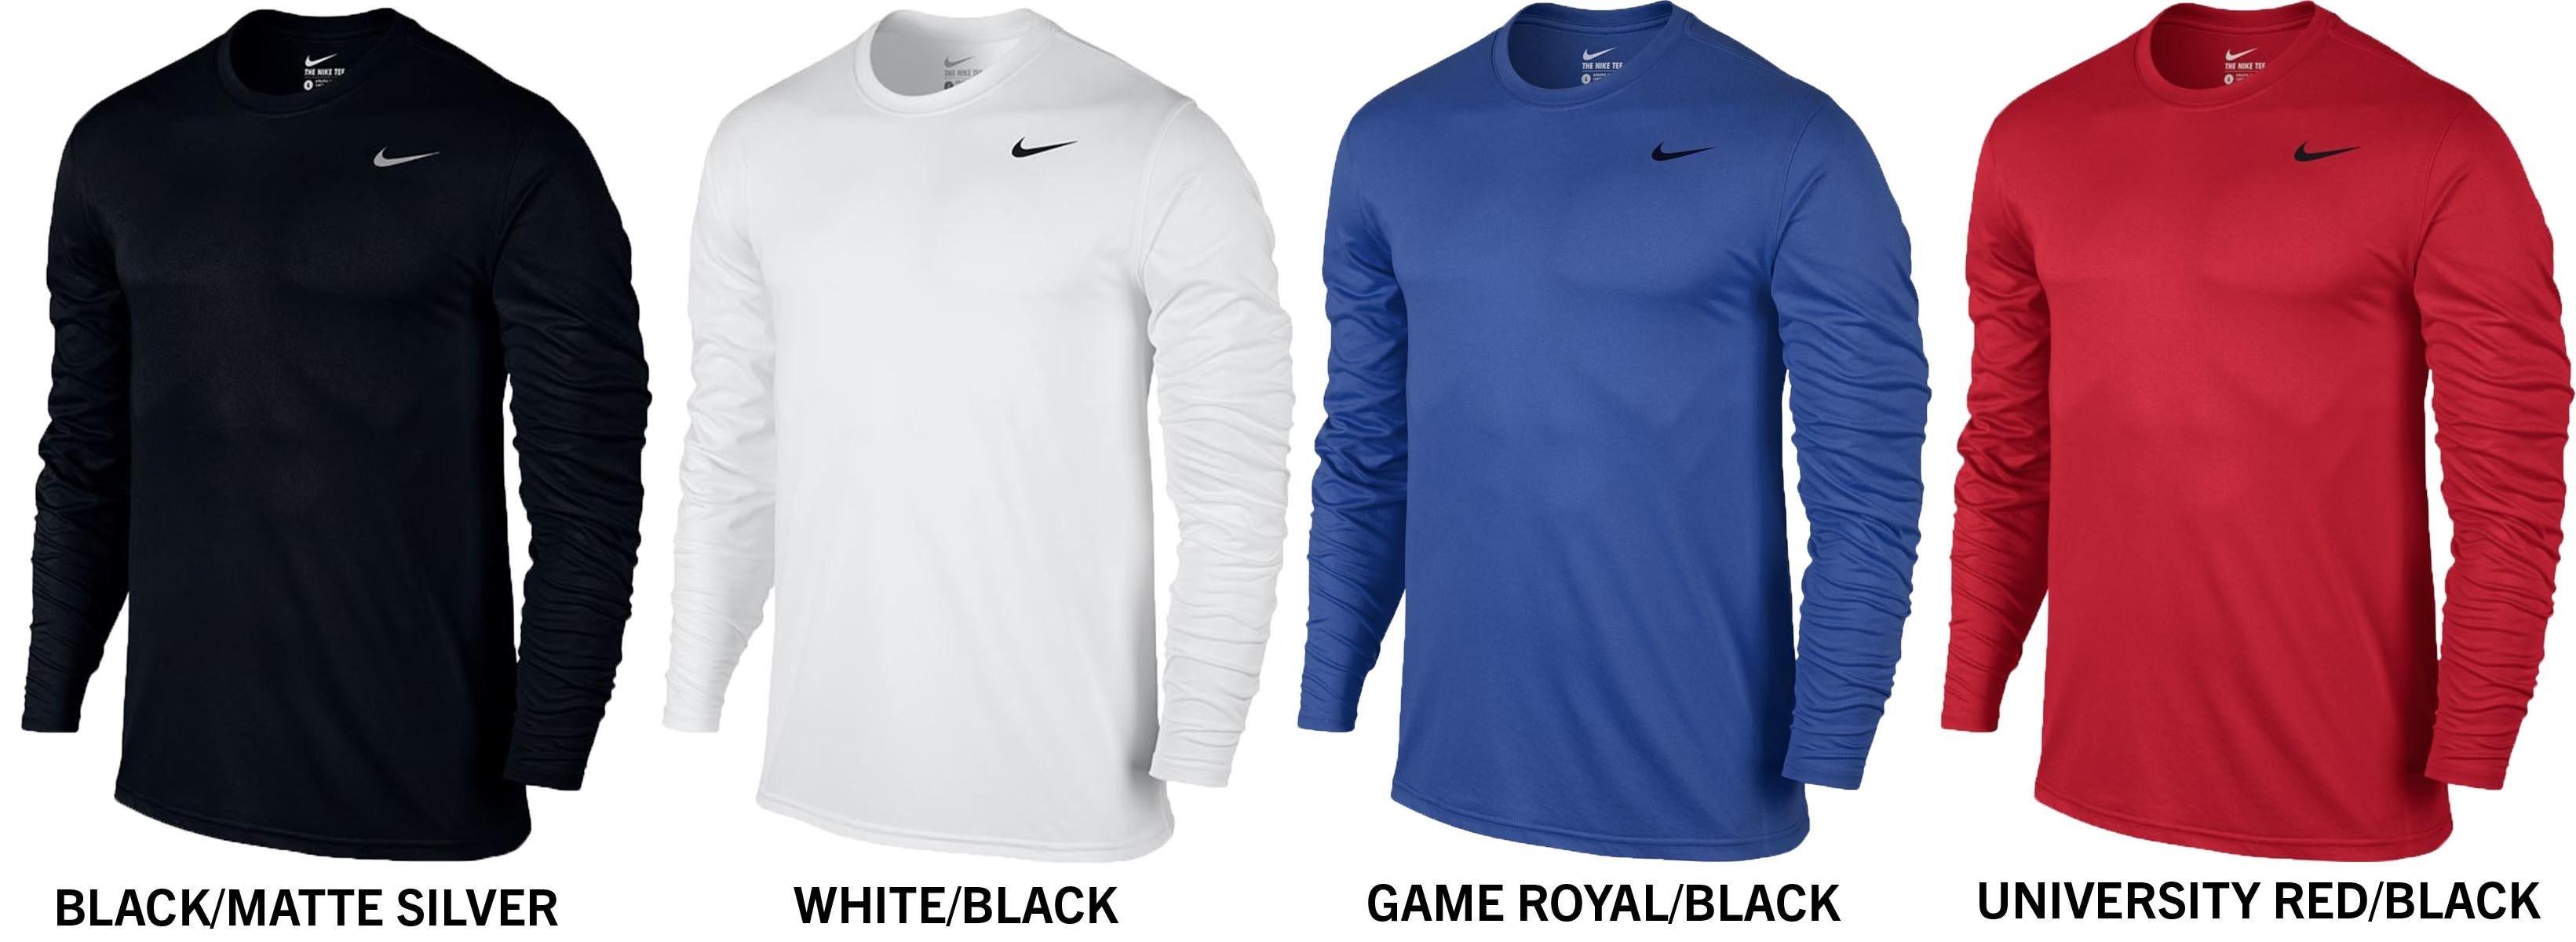 Details about Men's Gray Nike Dri Fit Shirt Nike Legend 2.0 Men's Training T Shirt *SIZE M*